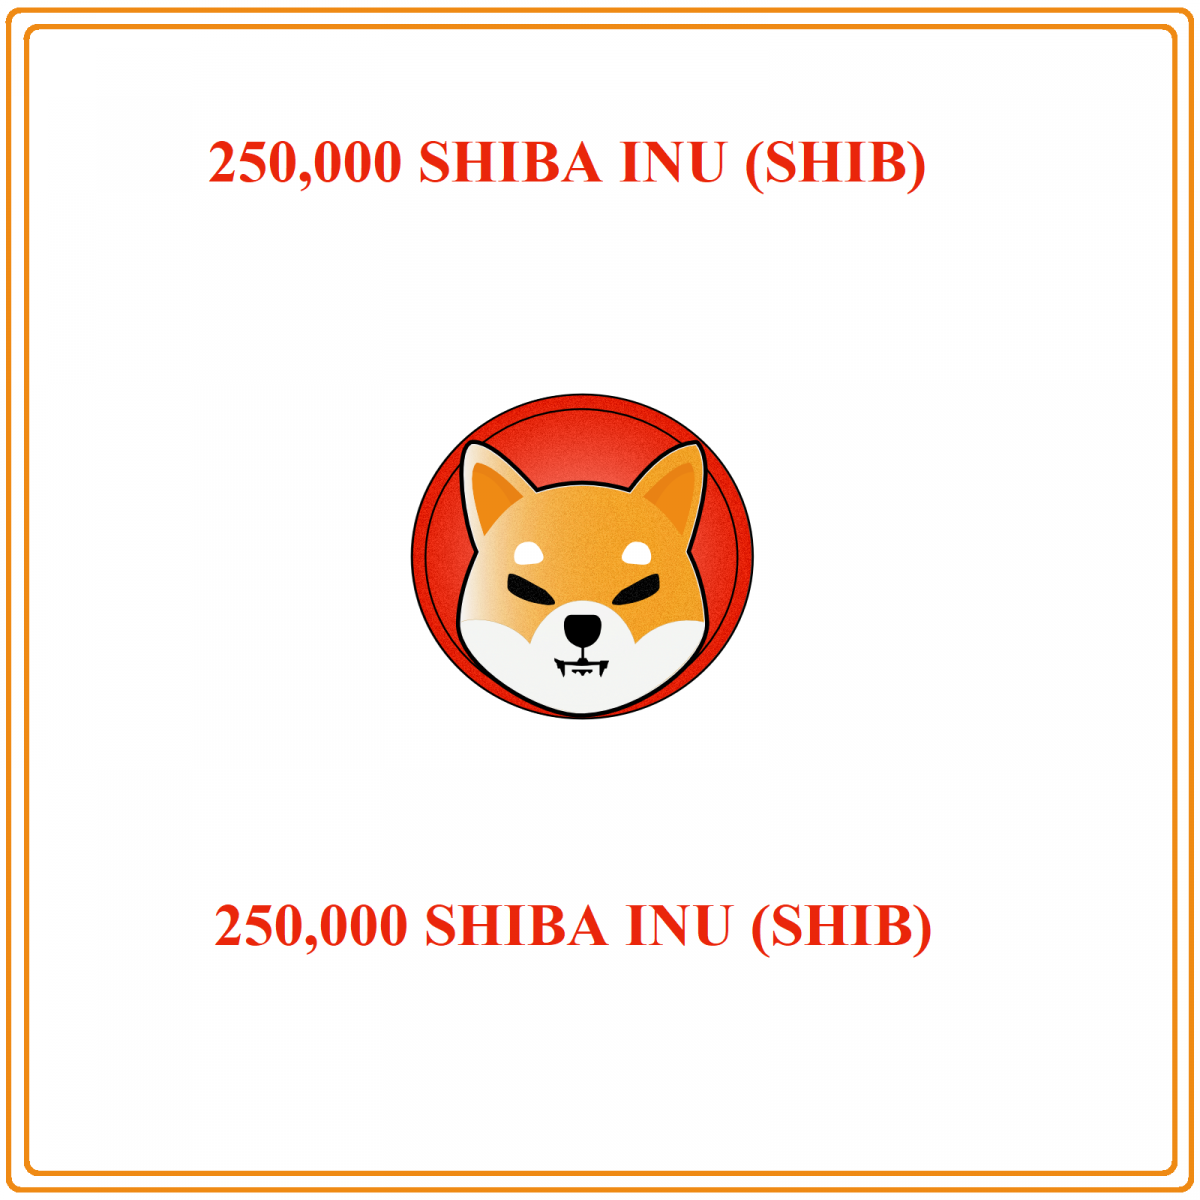 250000 SHIBA INU (SHIB) Mining Contract